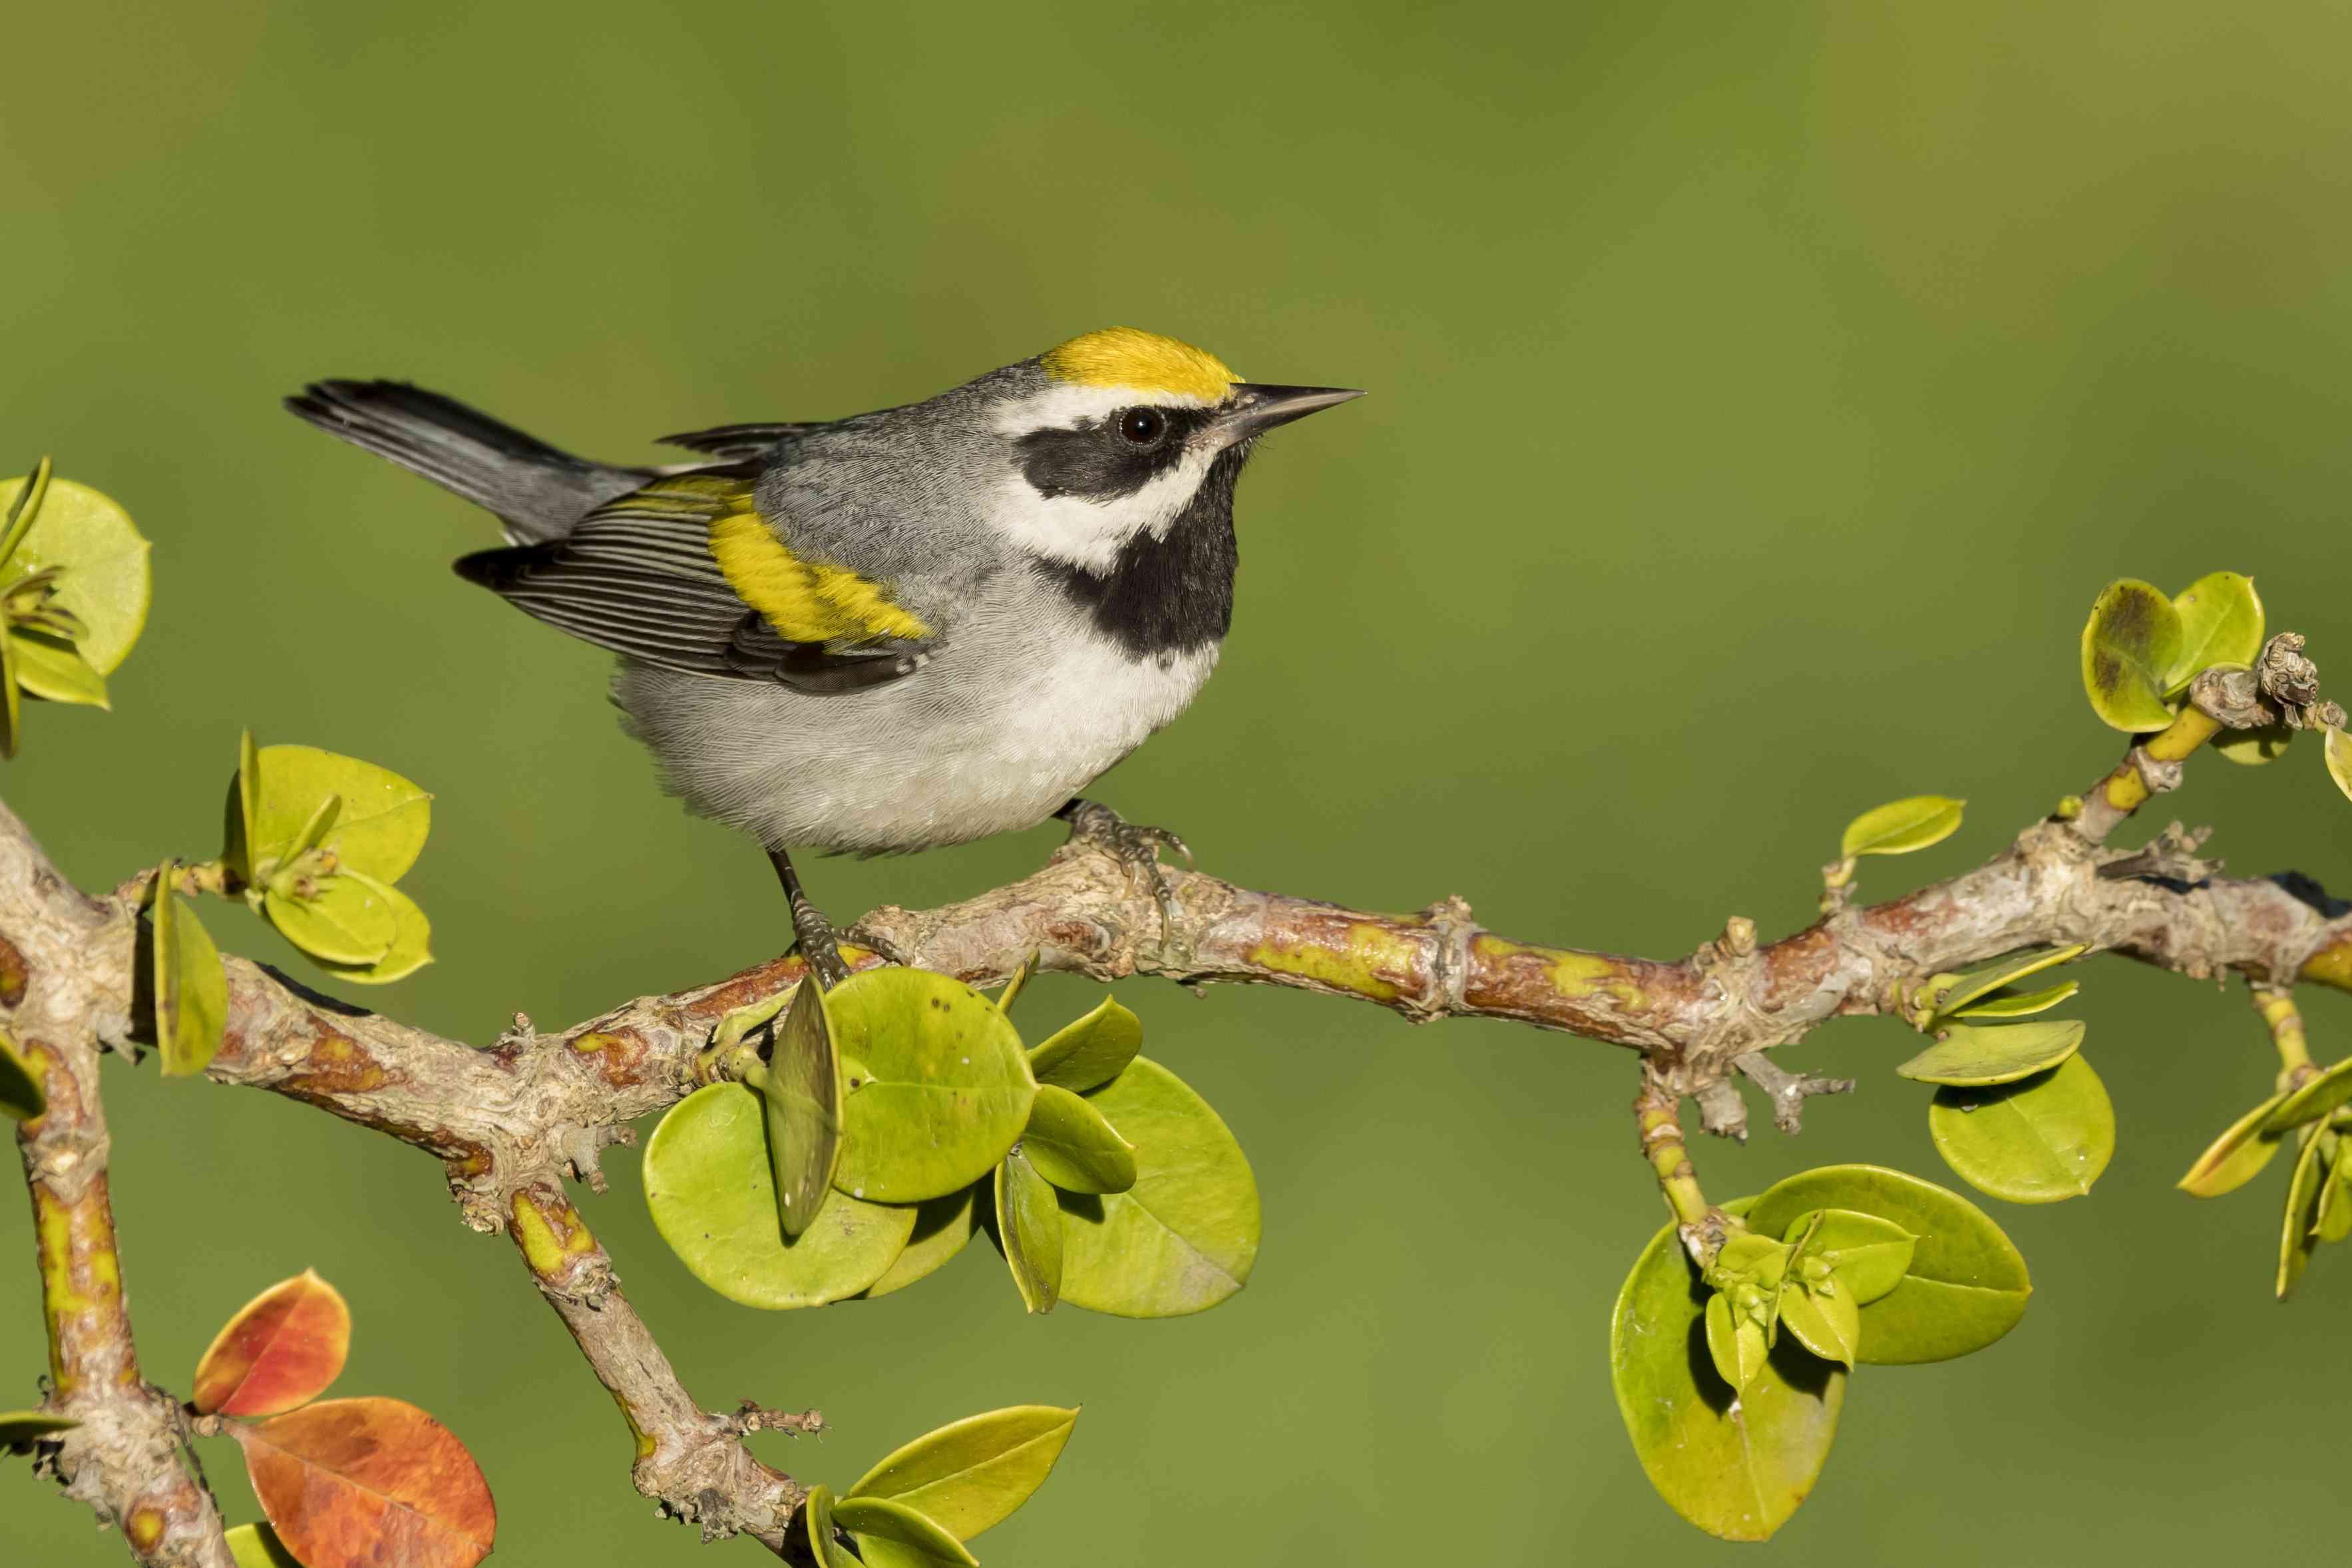 North American bird species: Golden-winged Warbler, Vermivora chrysoptera